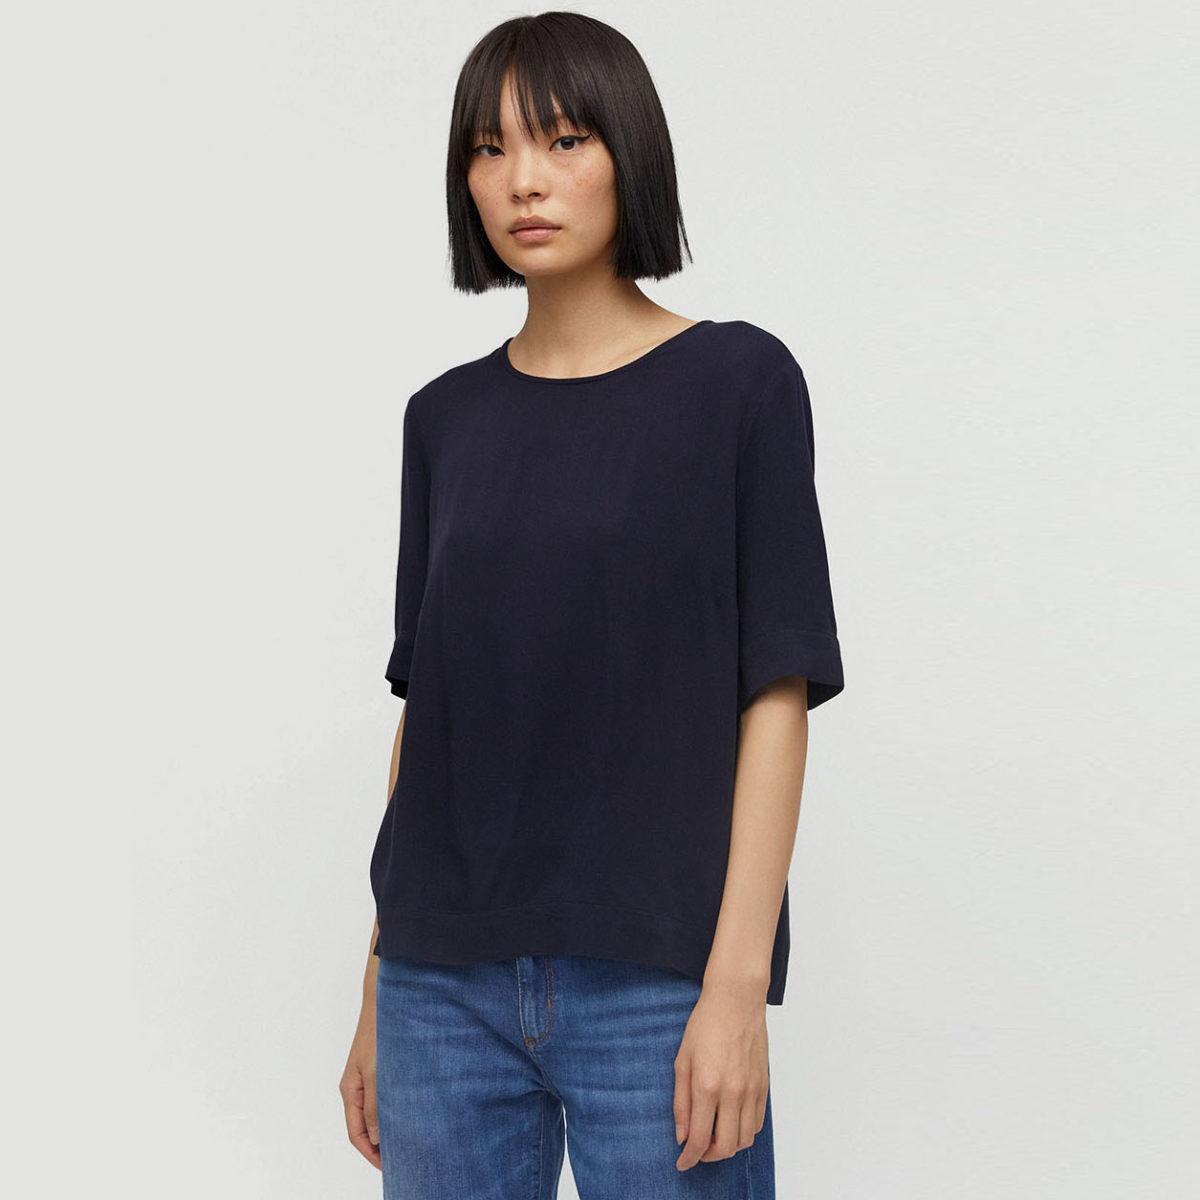 Loriaa blus 100% EcoVero